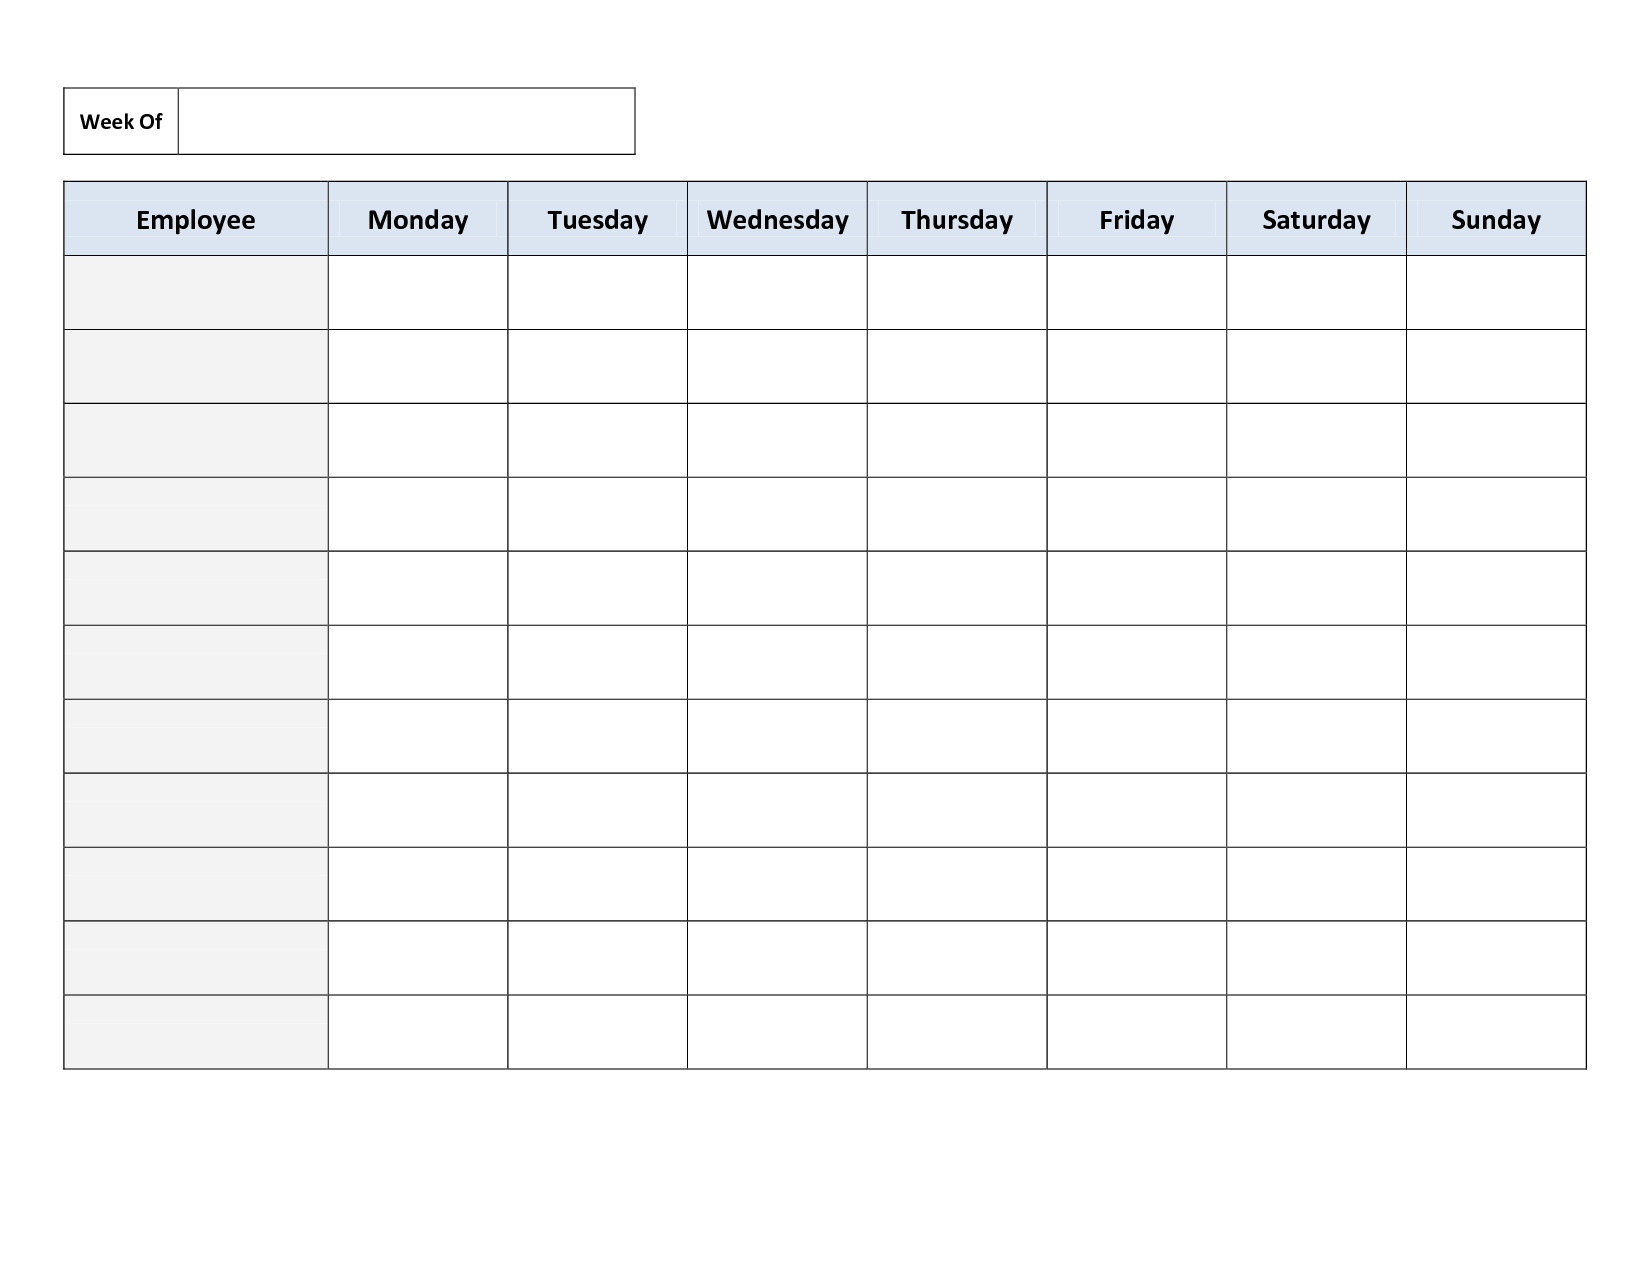 Weekly Employee Work Schedule Template. Free Blank Schedule.pdf - Free Printable Work Schedule Maker